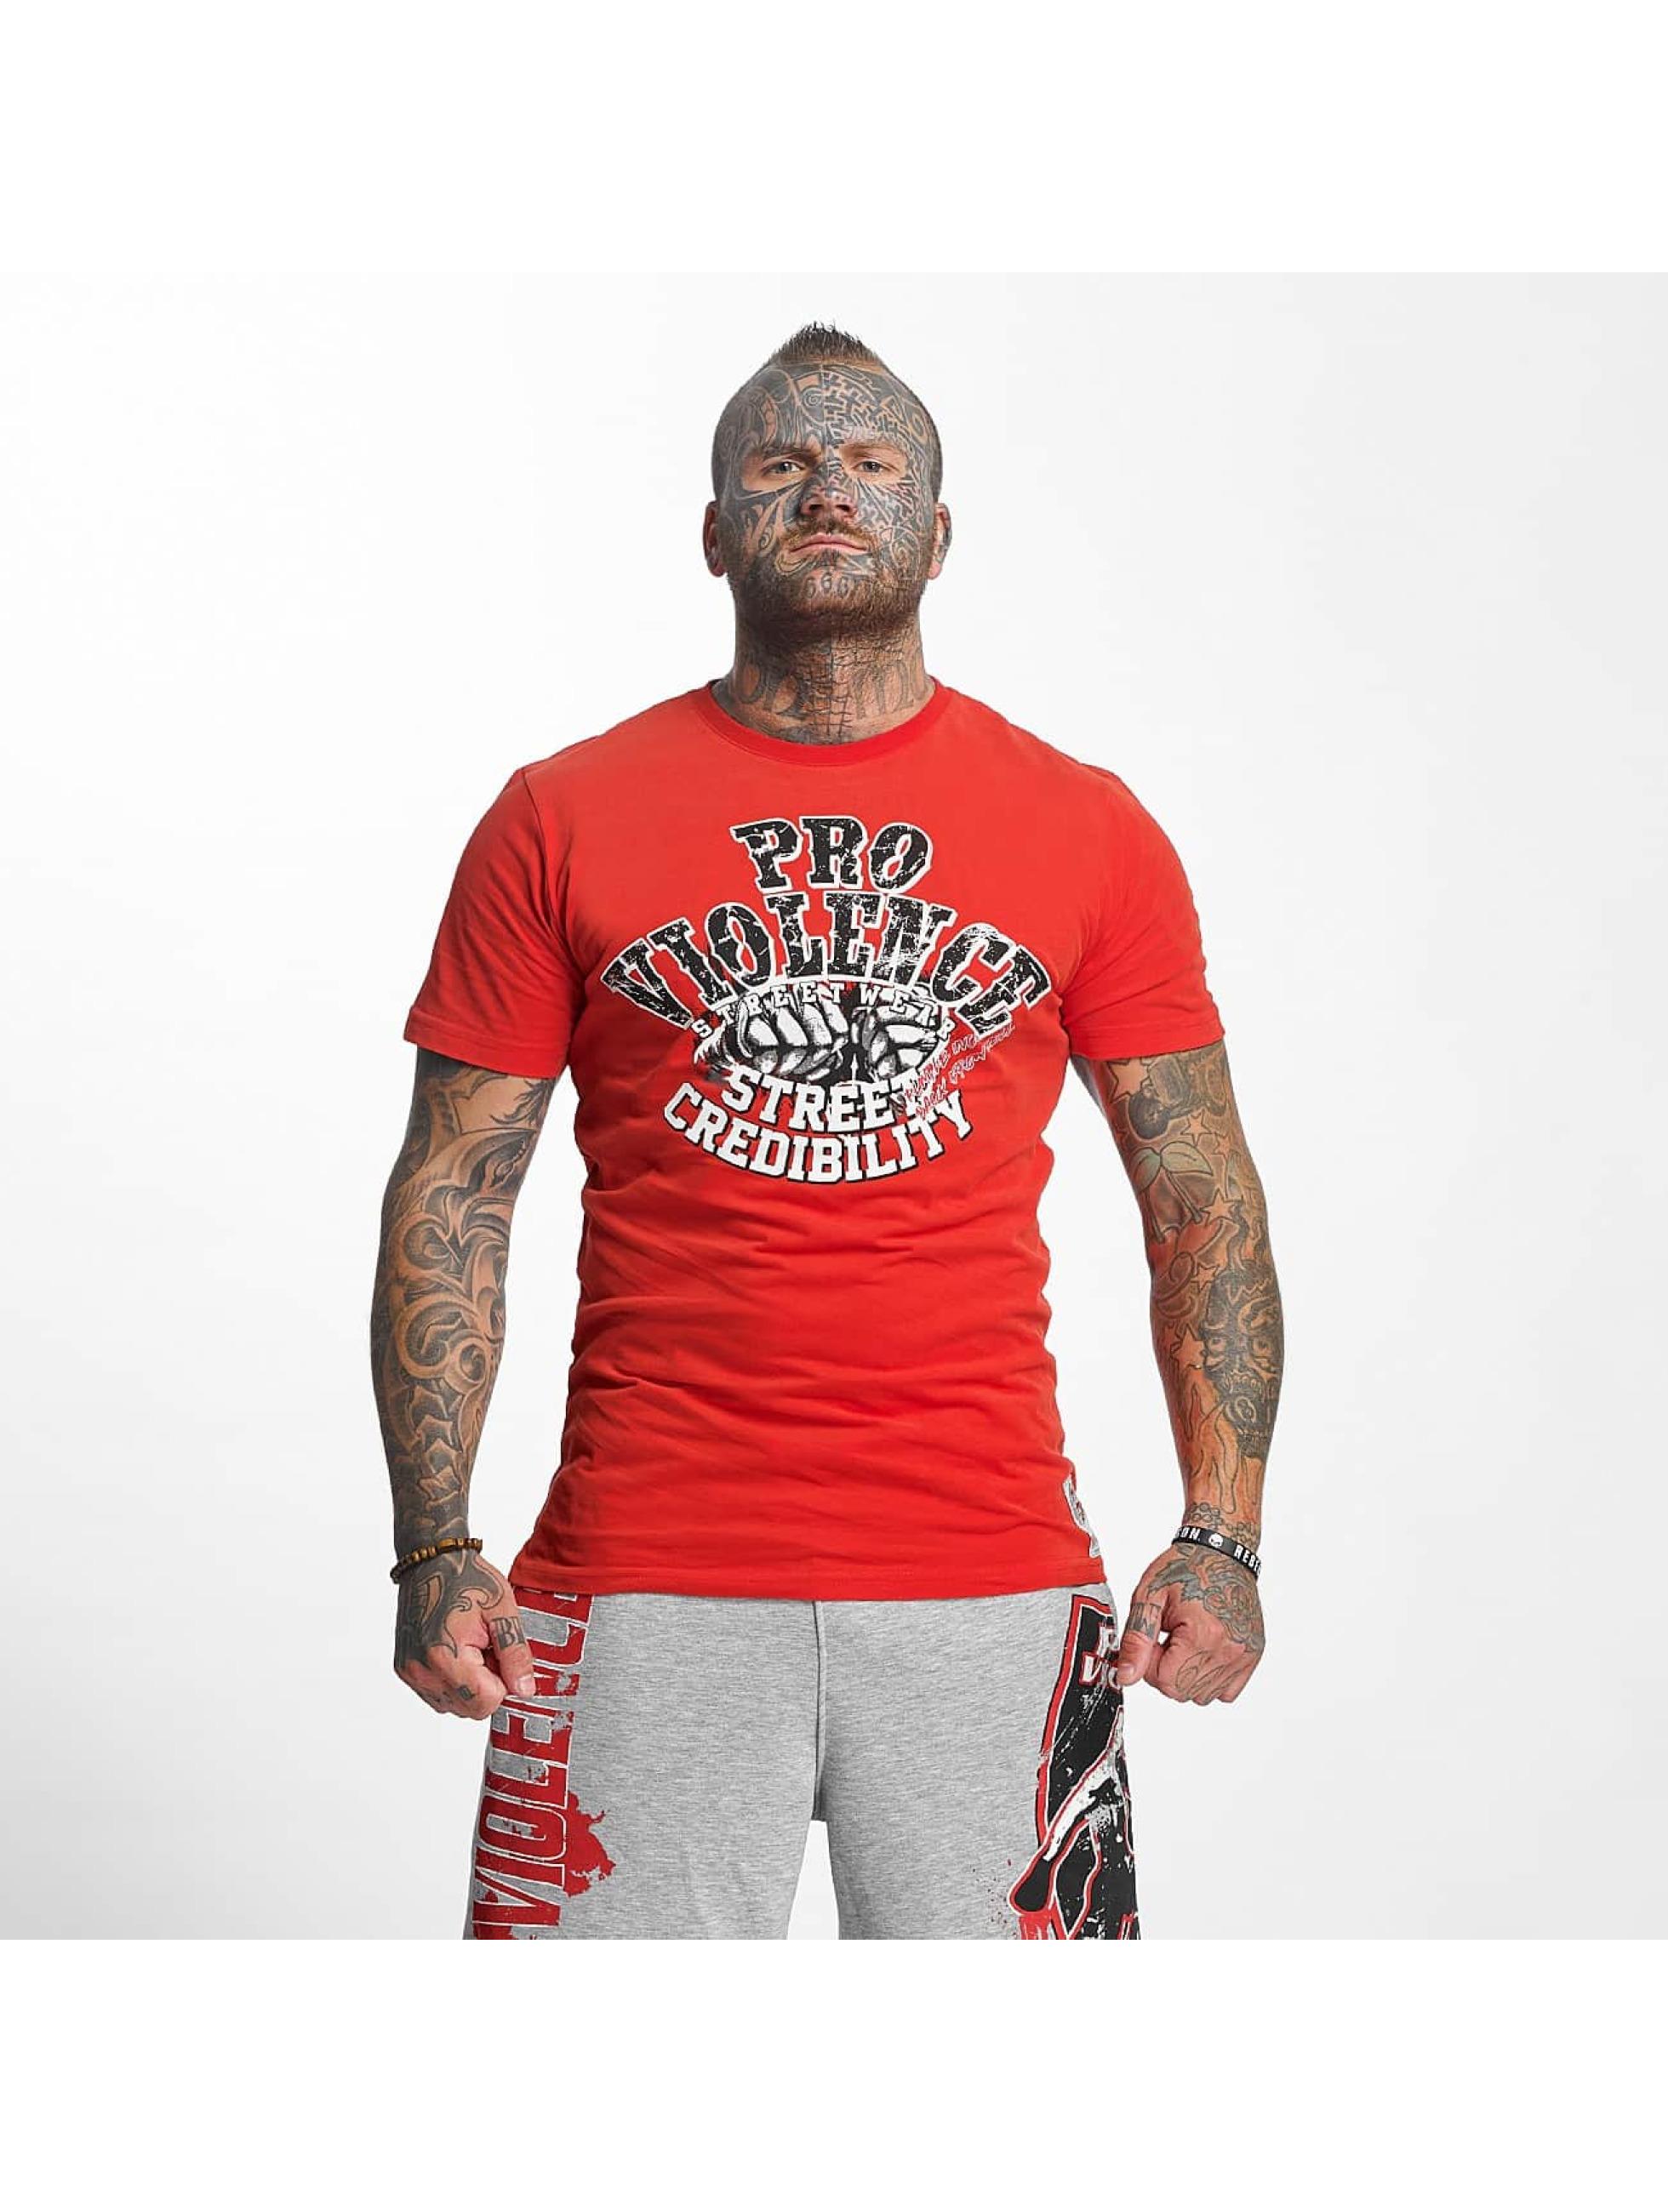 Pro Violence Streetwear T-Shirt Street Ceidbilty rot